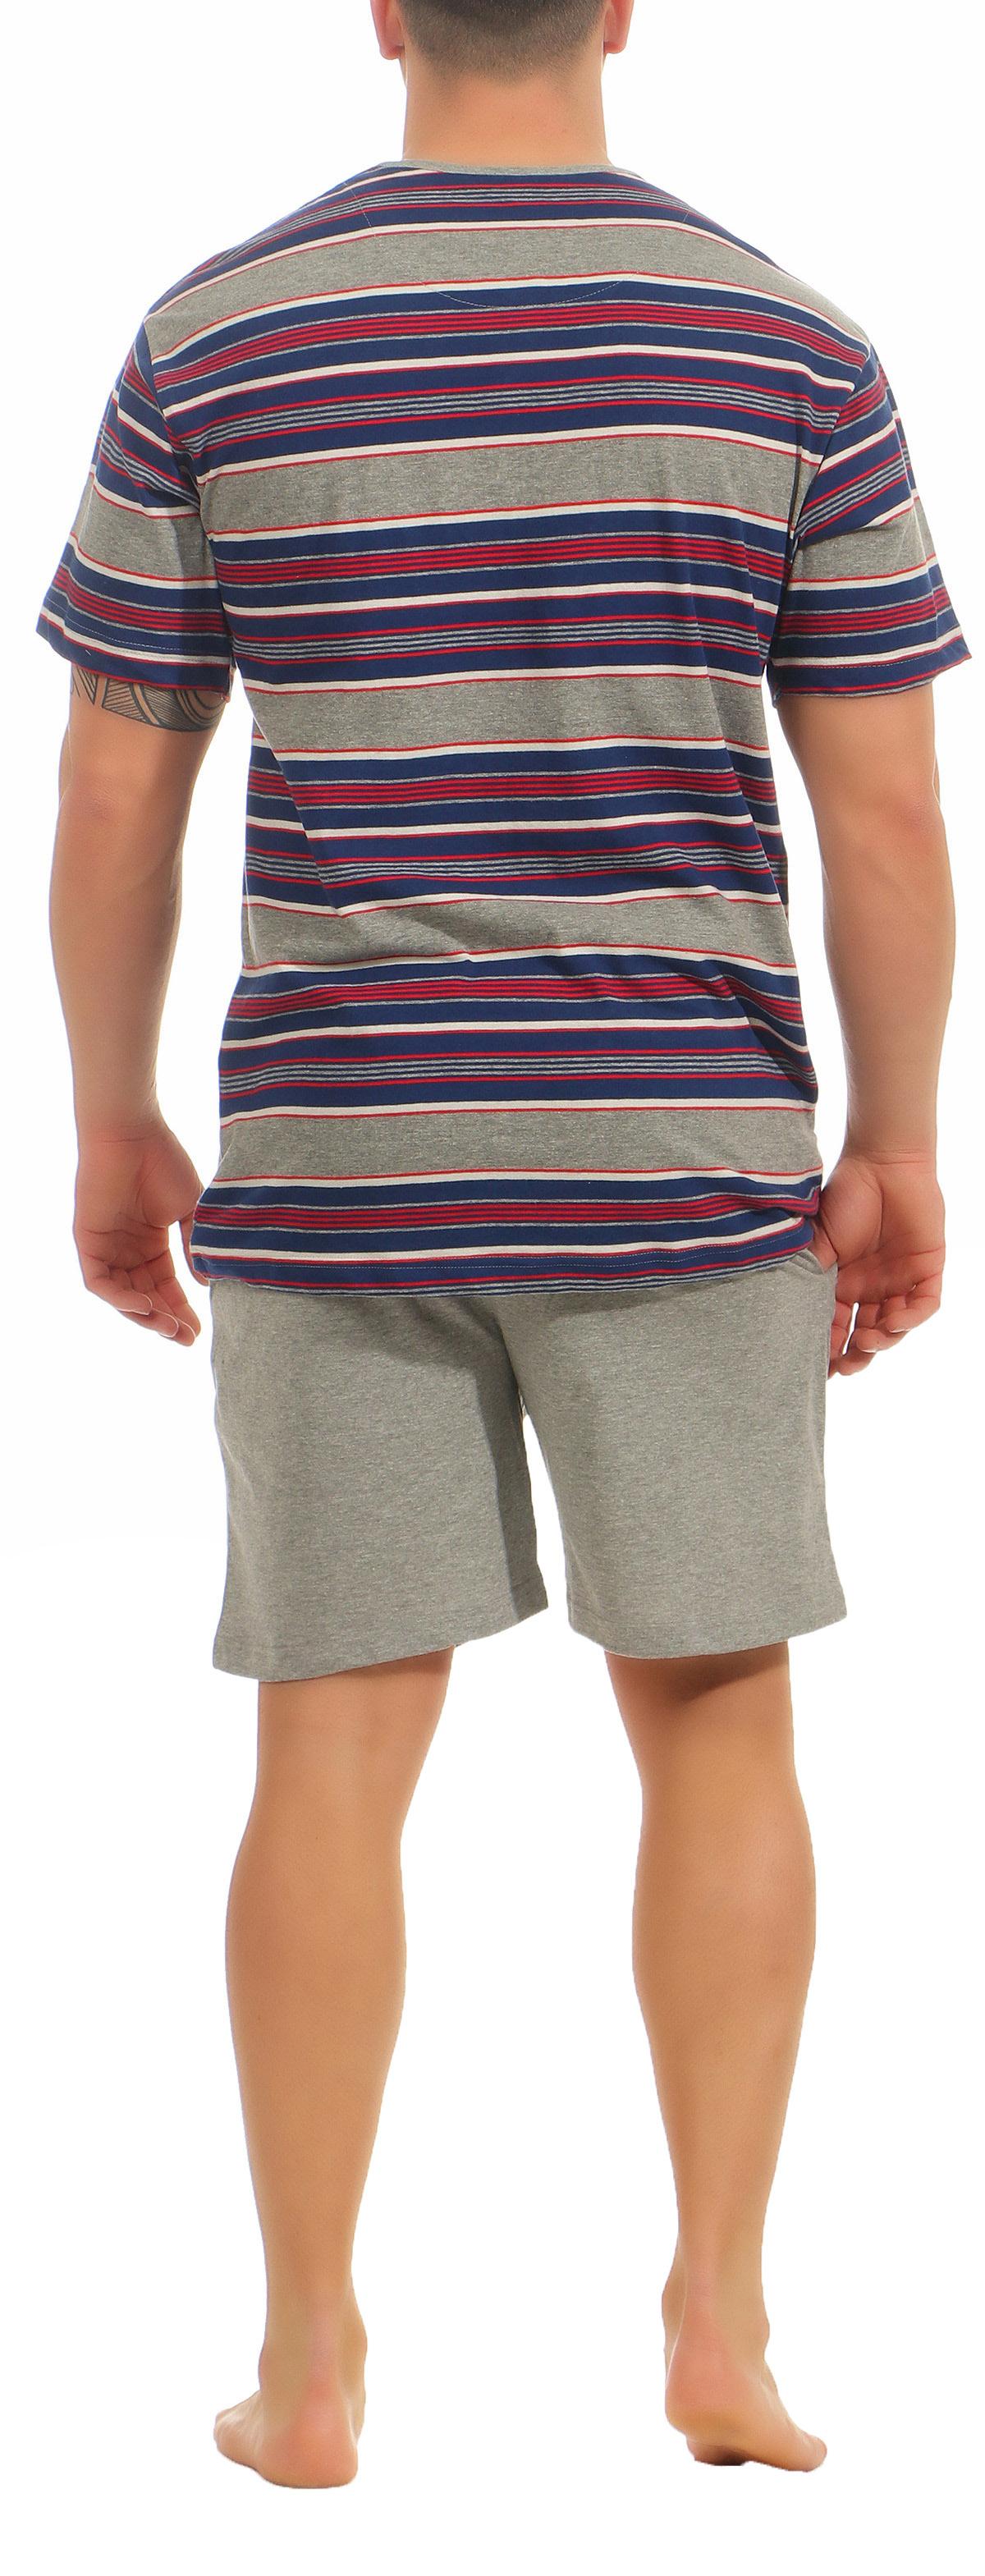 Eleganter Herren Shorty Pyjama kurzam von NORMANN – Streifenoptik - 105 90 532 – Bild 4